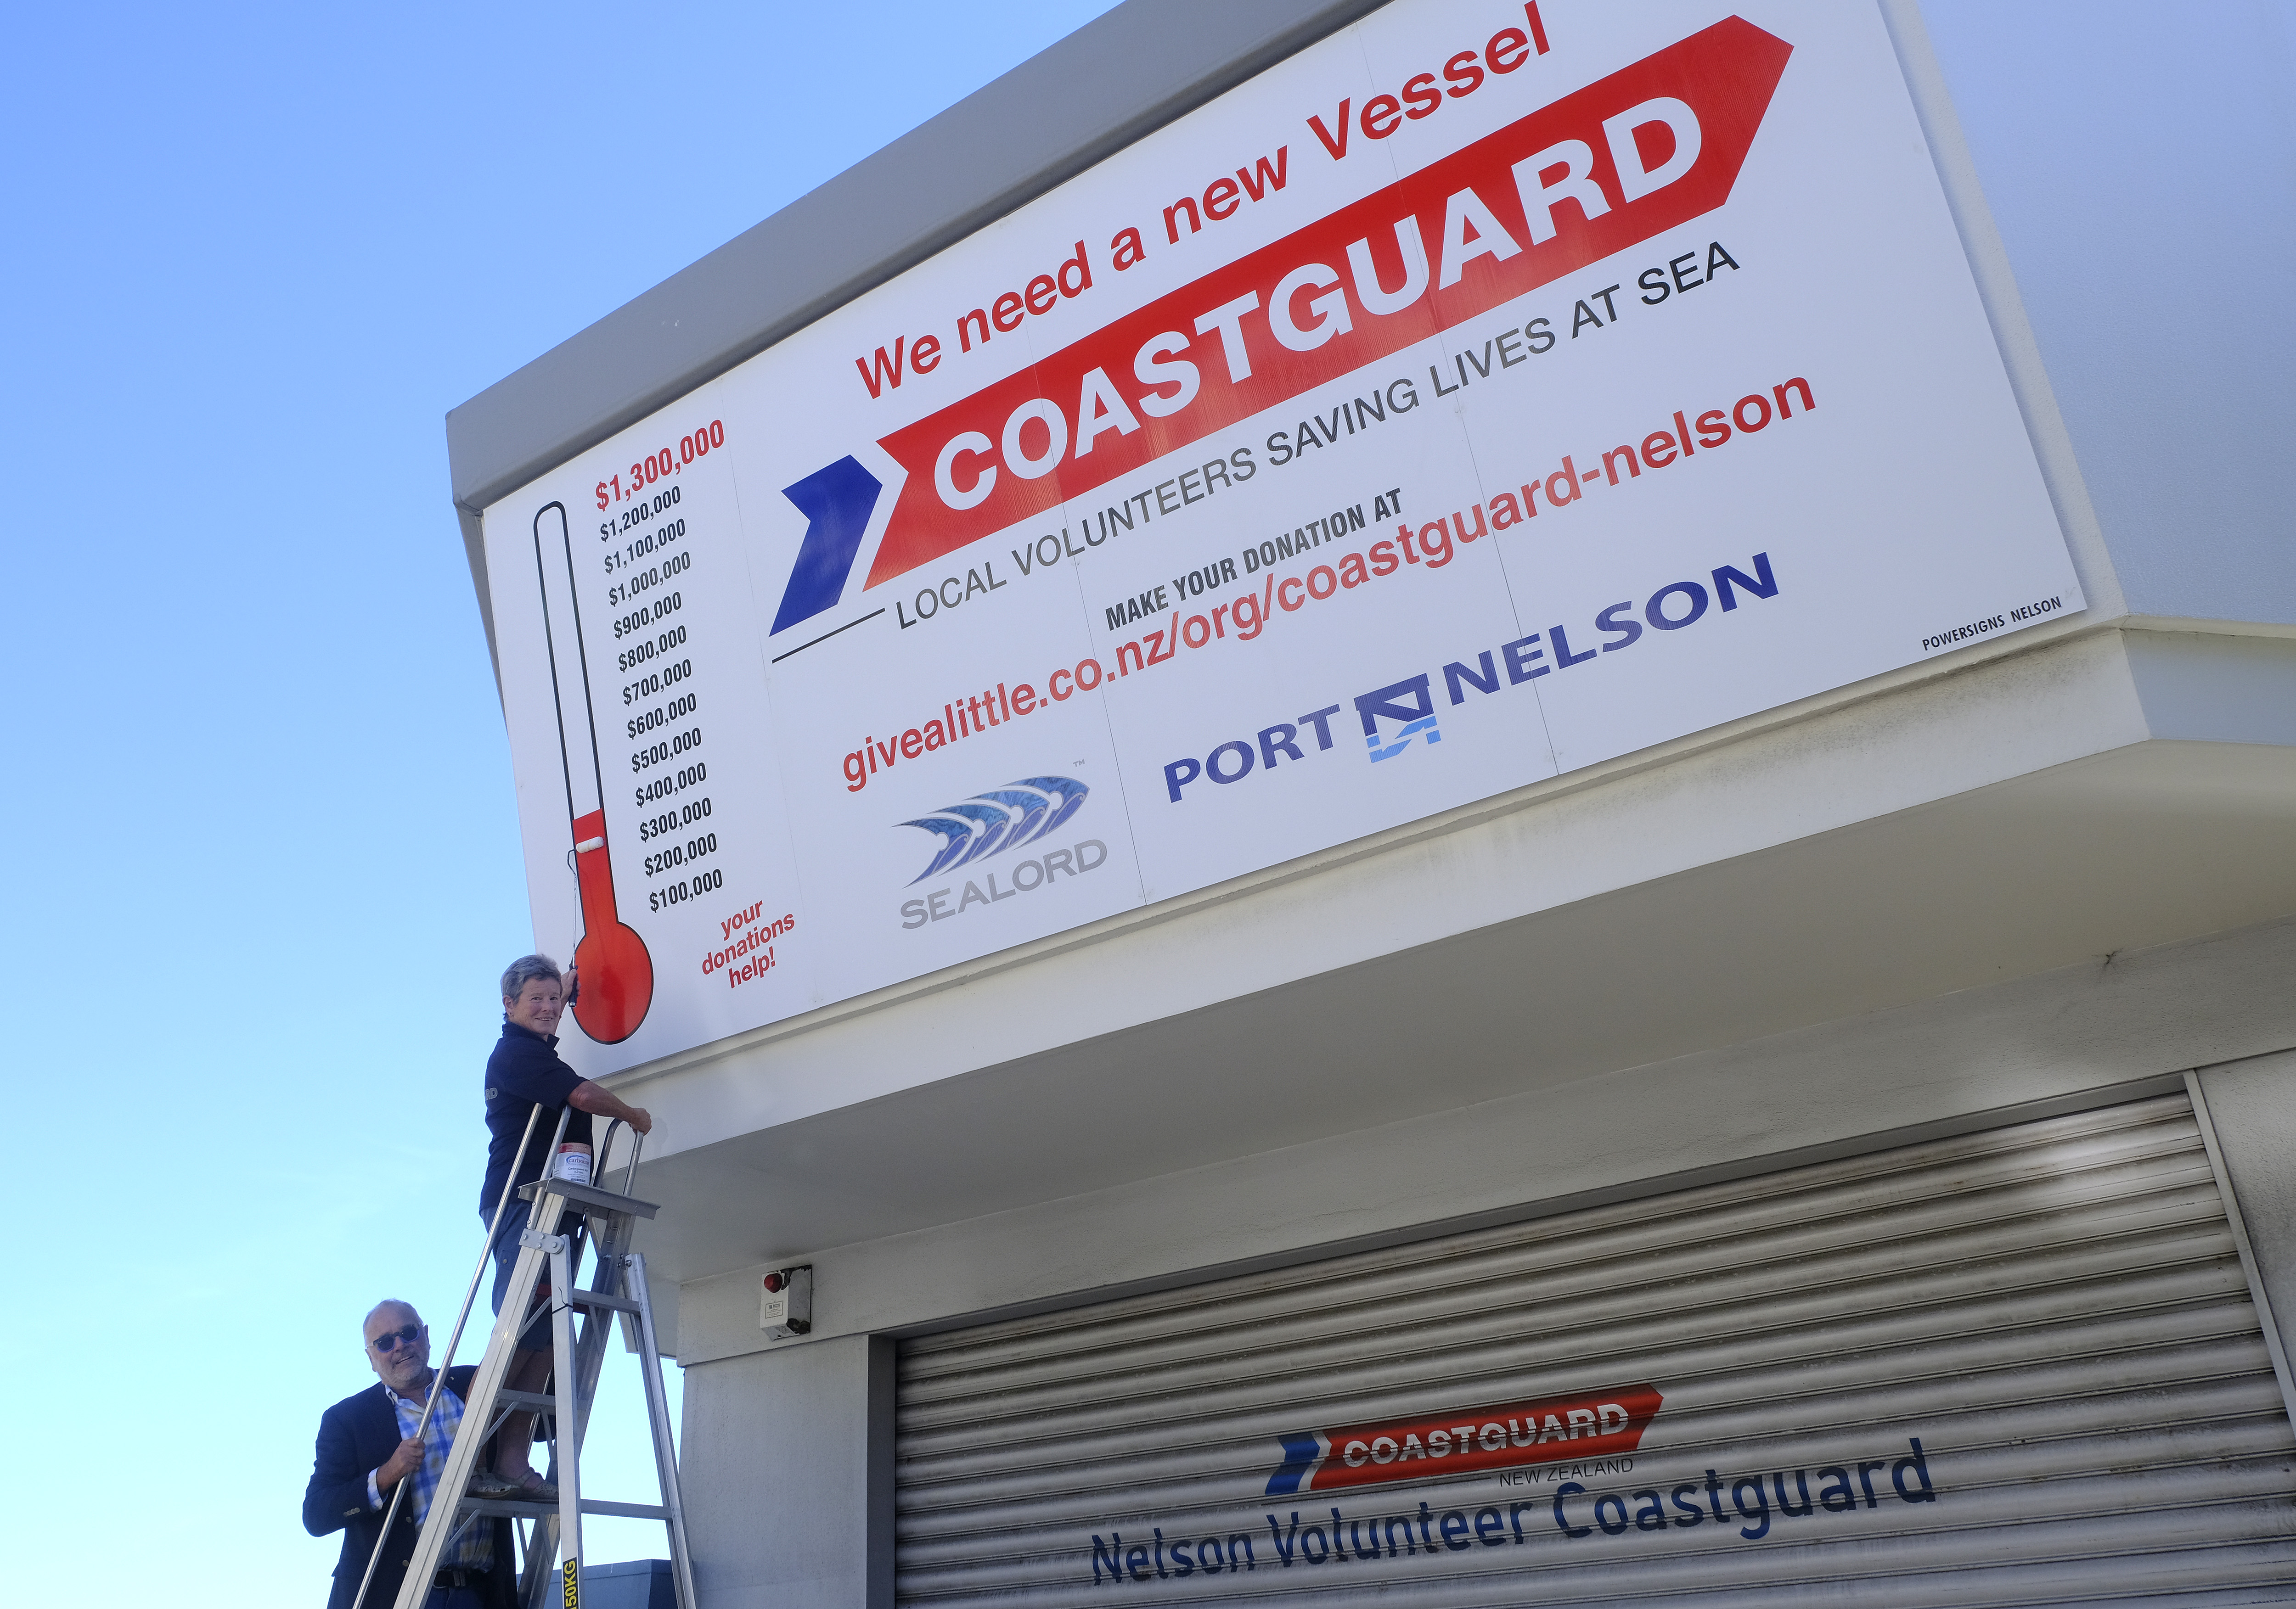 Coastguard1865